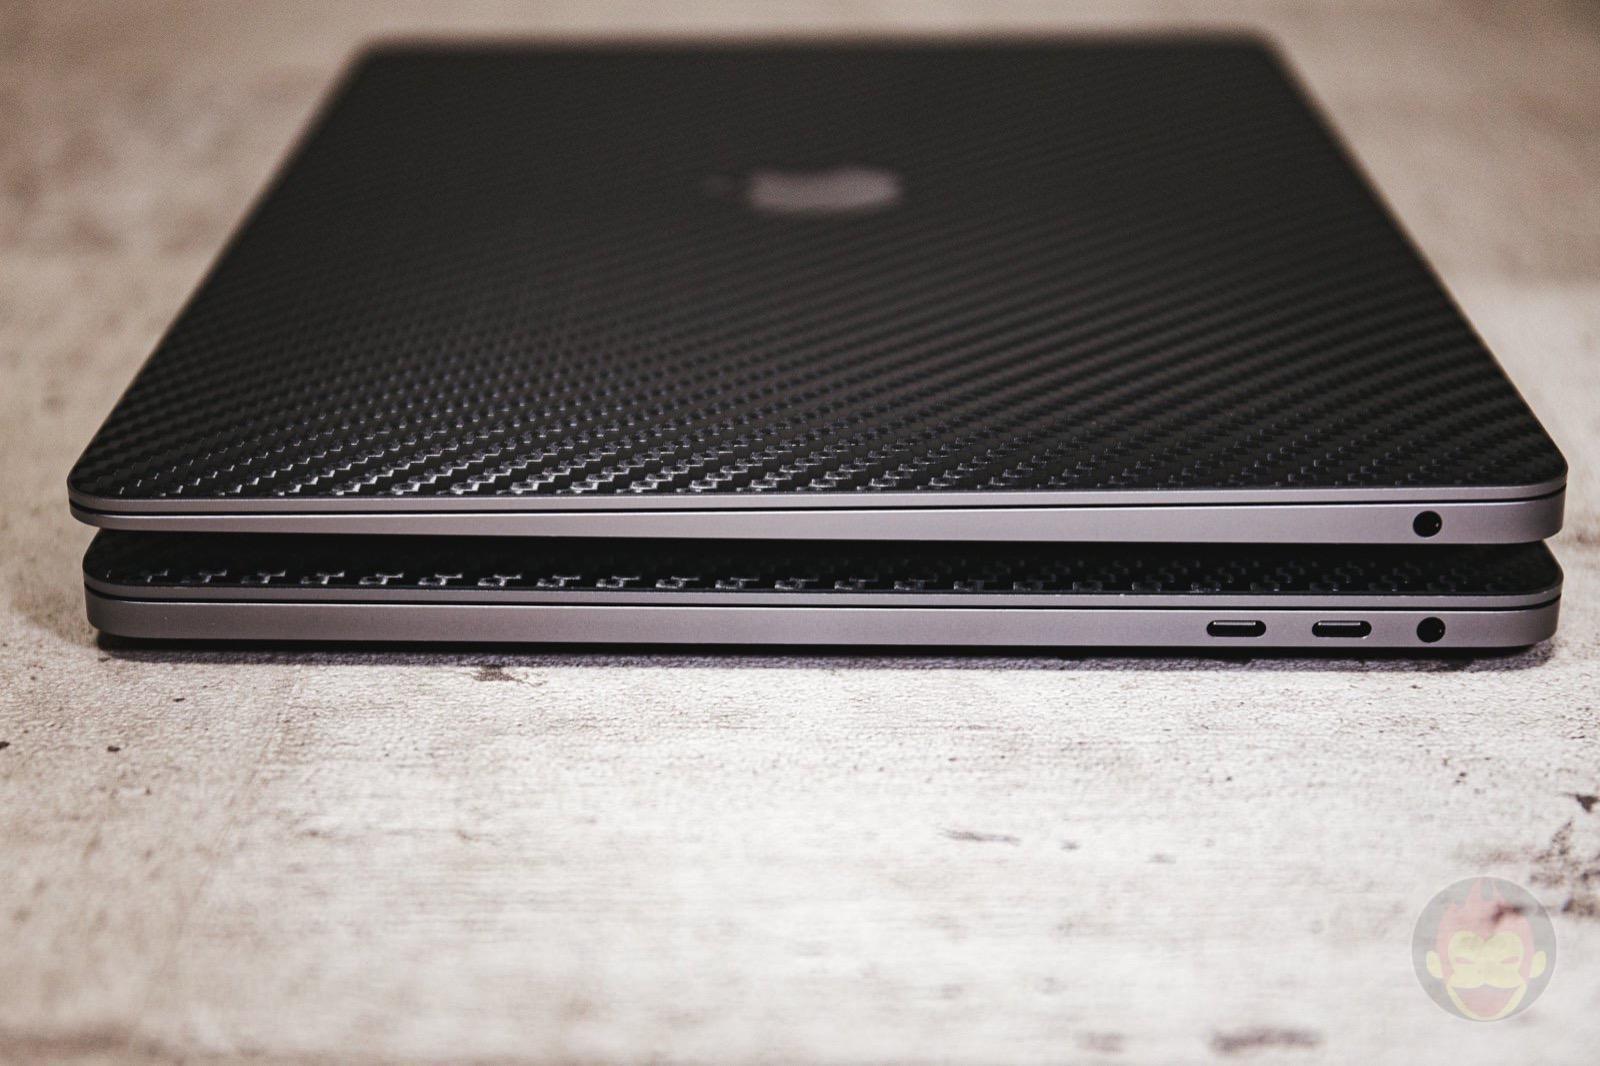 MacBook-Air-and-Pro-Comparison-2019-02.jpg